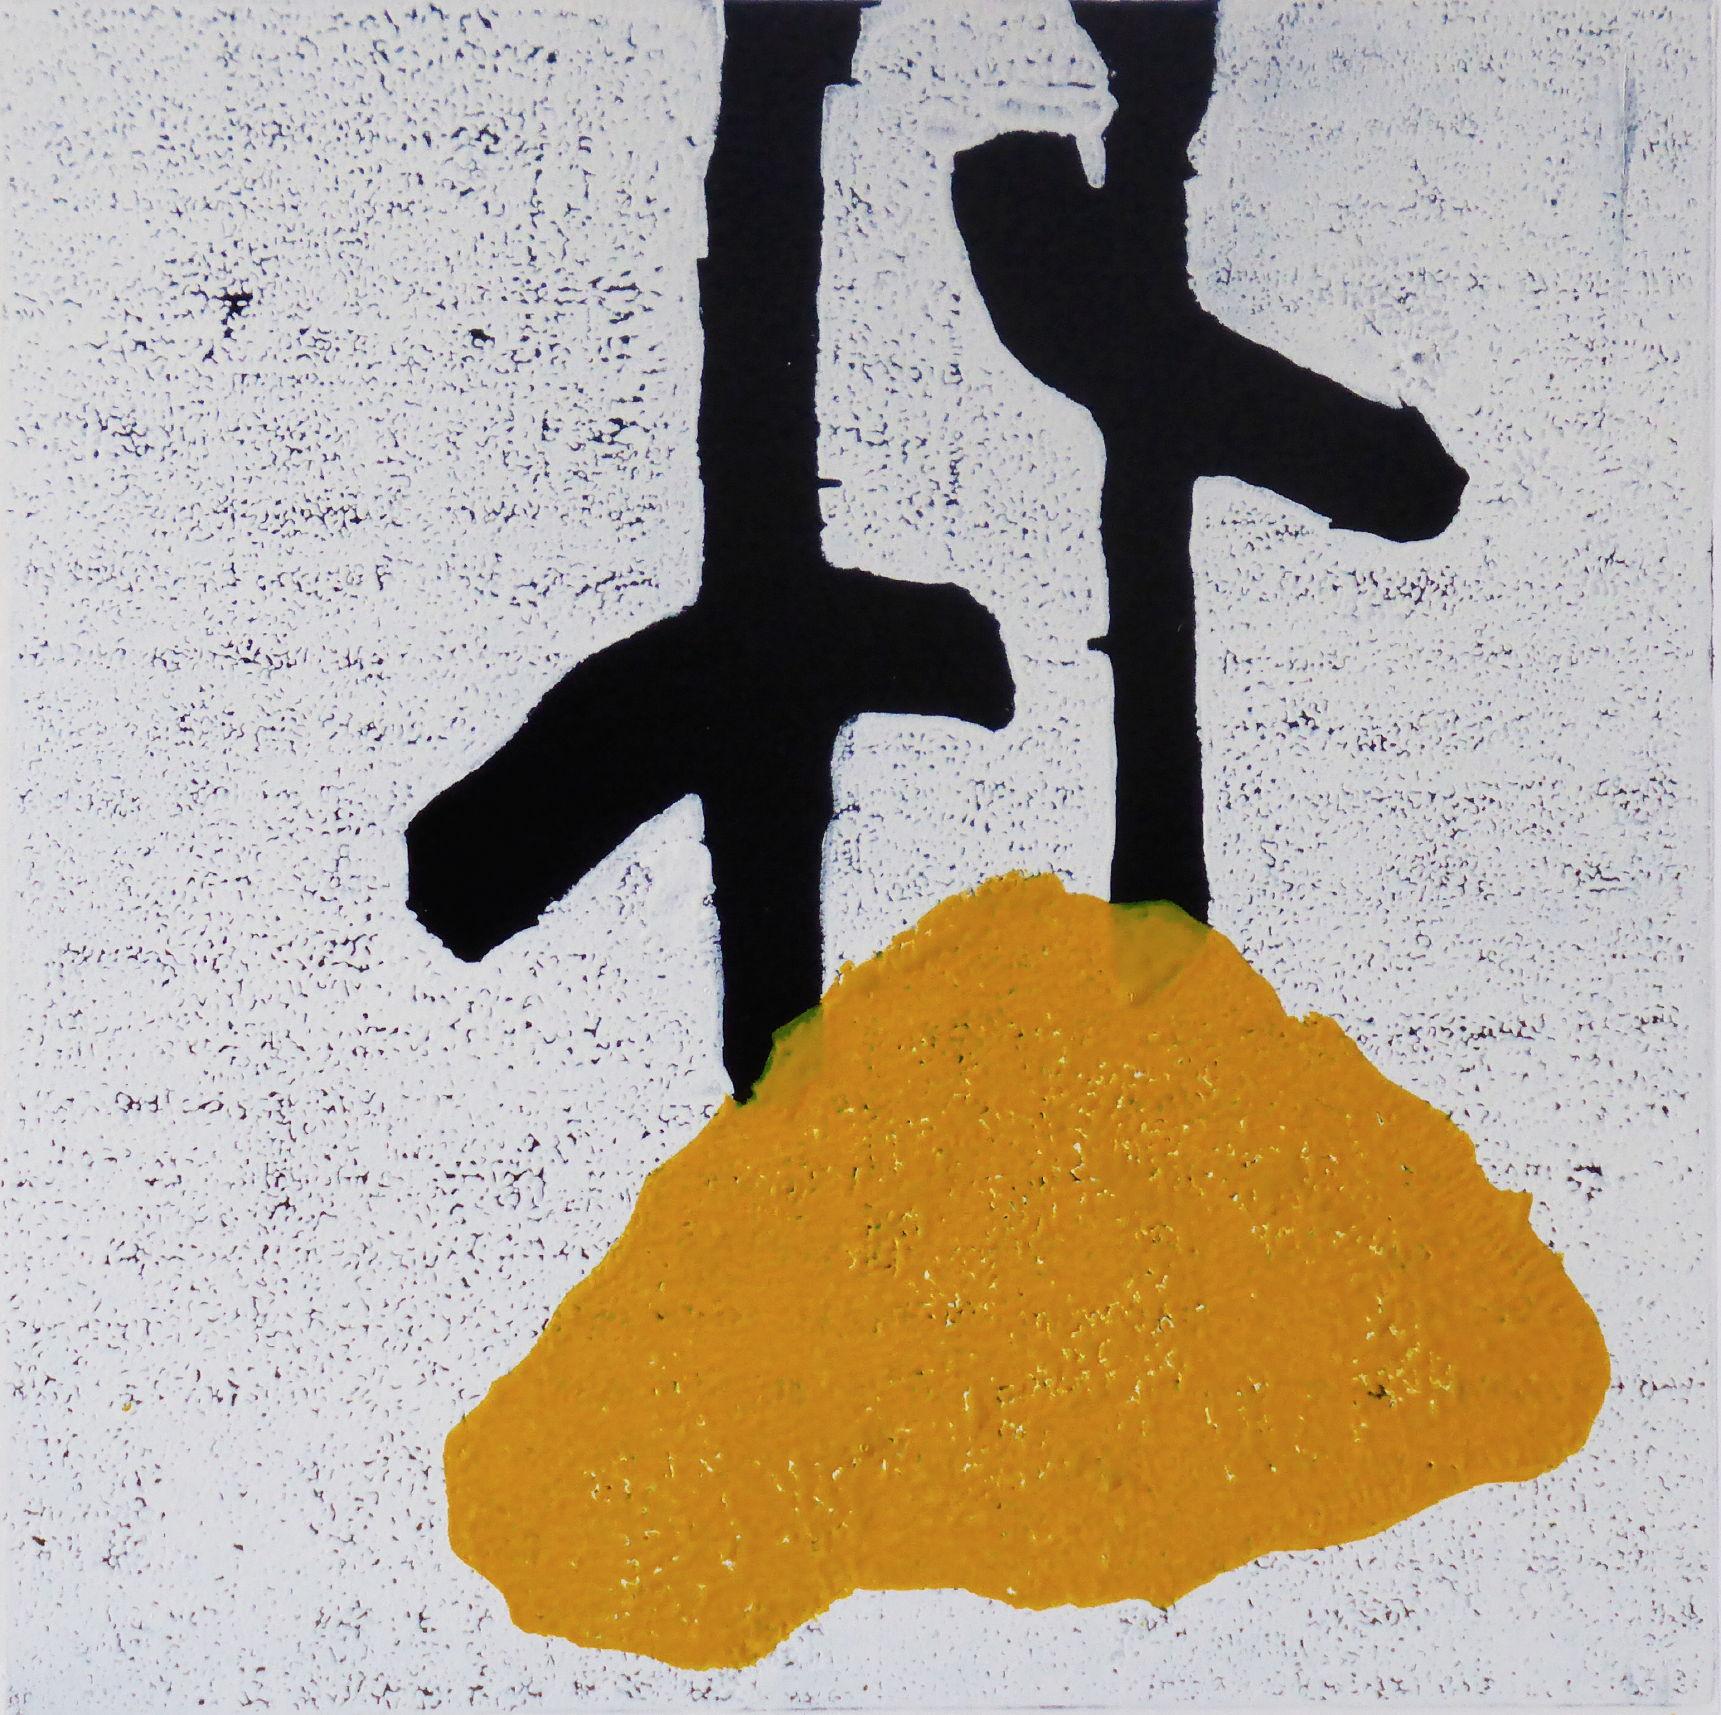 Tangentia 3, Farbholzschnitt, 35x35cm, 2014